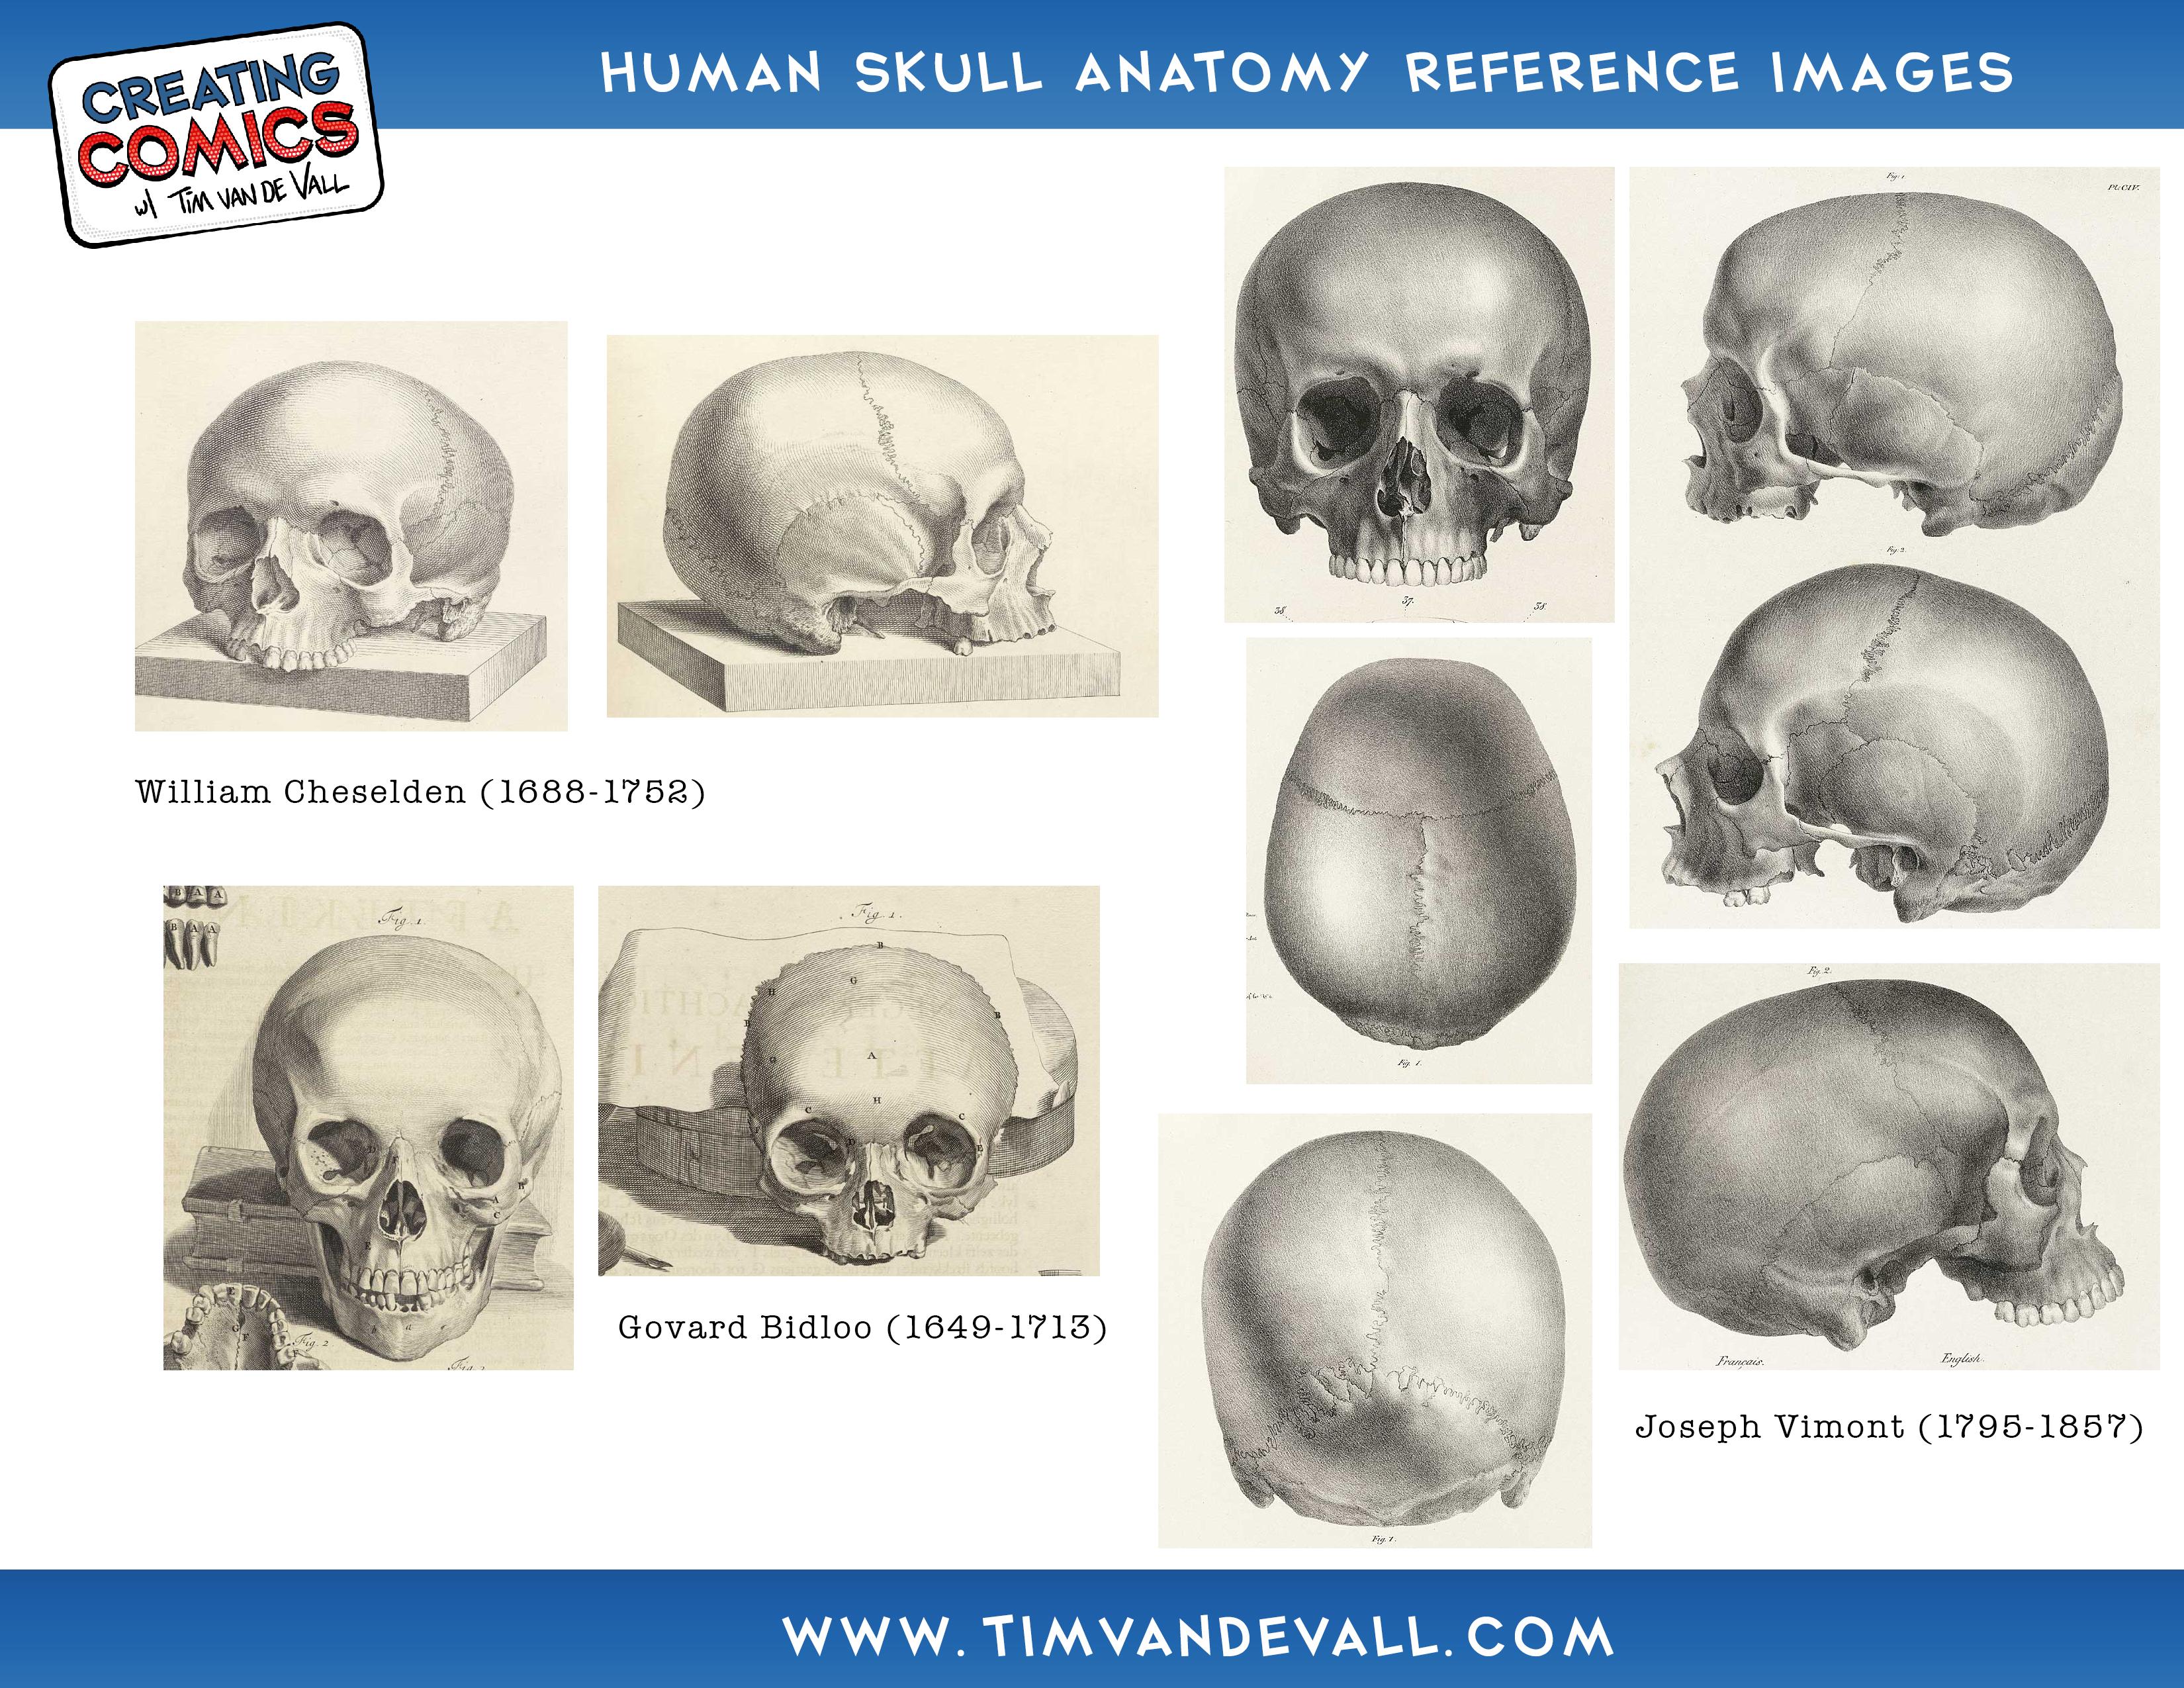 Human Anatomy Skull Pictures Human Skull Anatomy